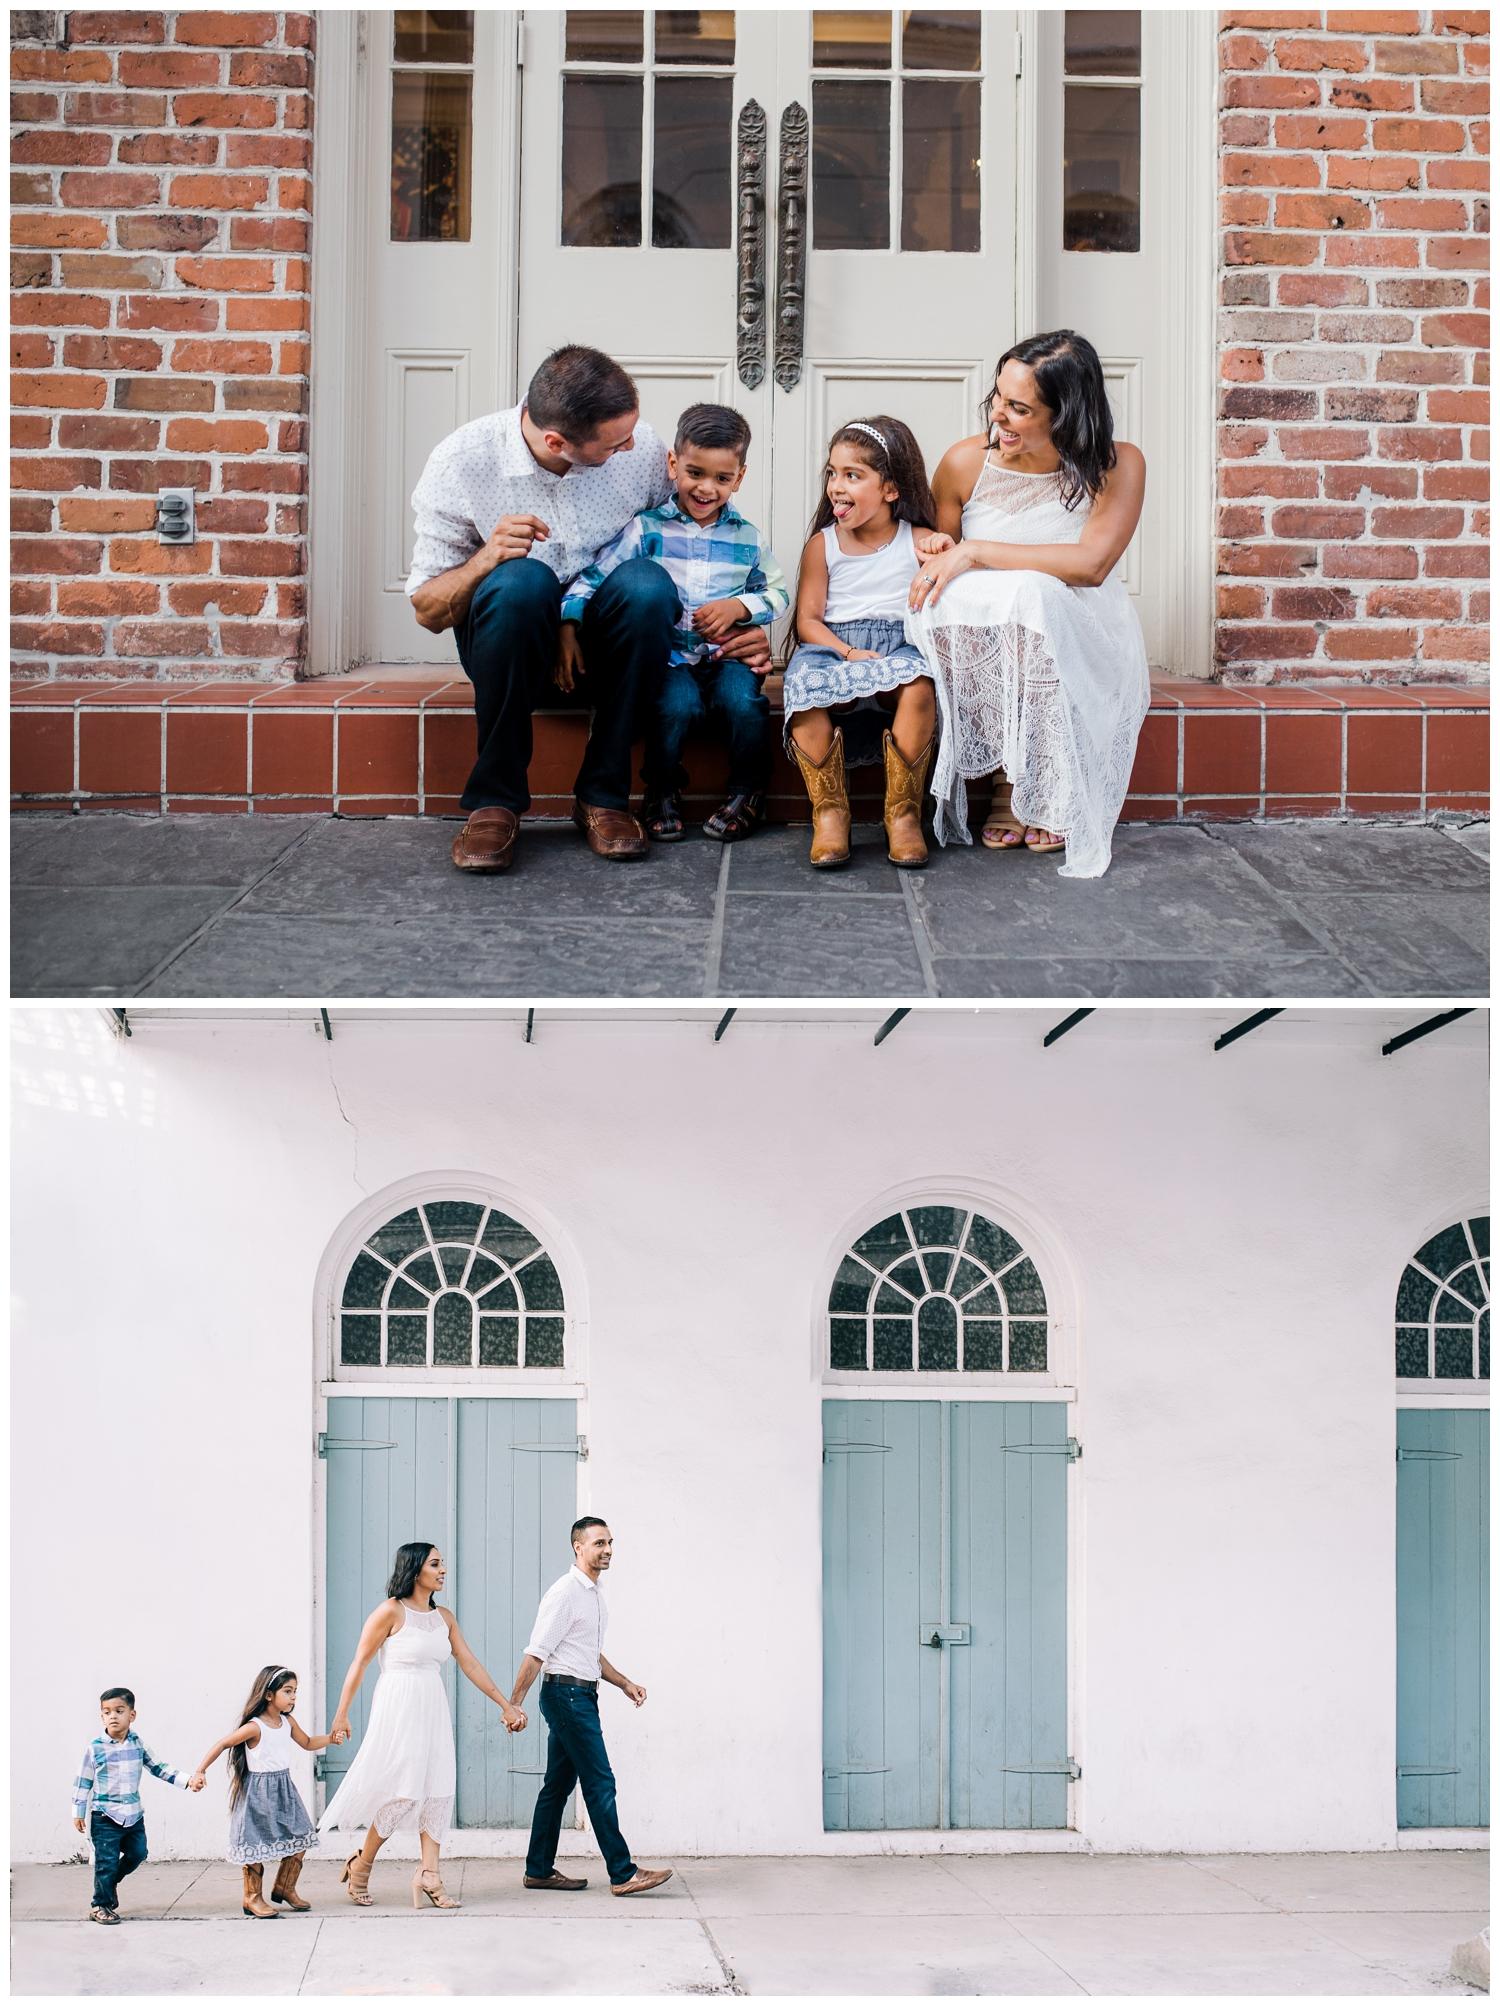 New-Orleans-family-photography- french-quarter-kallistia-photography_0006.jpg